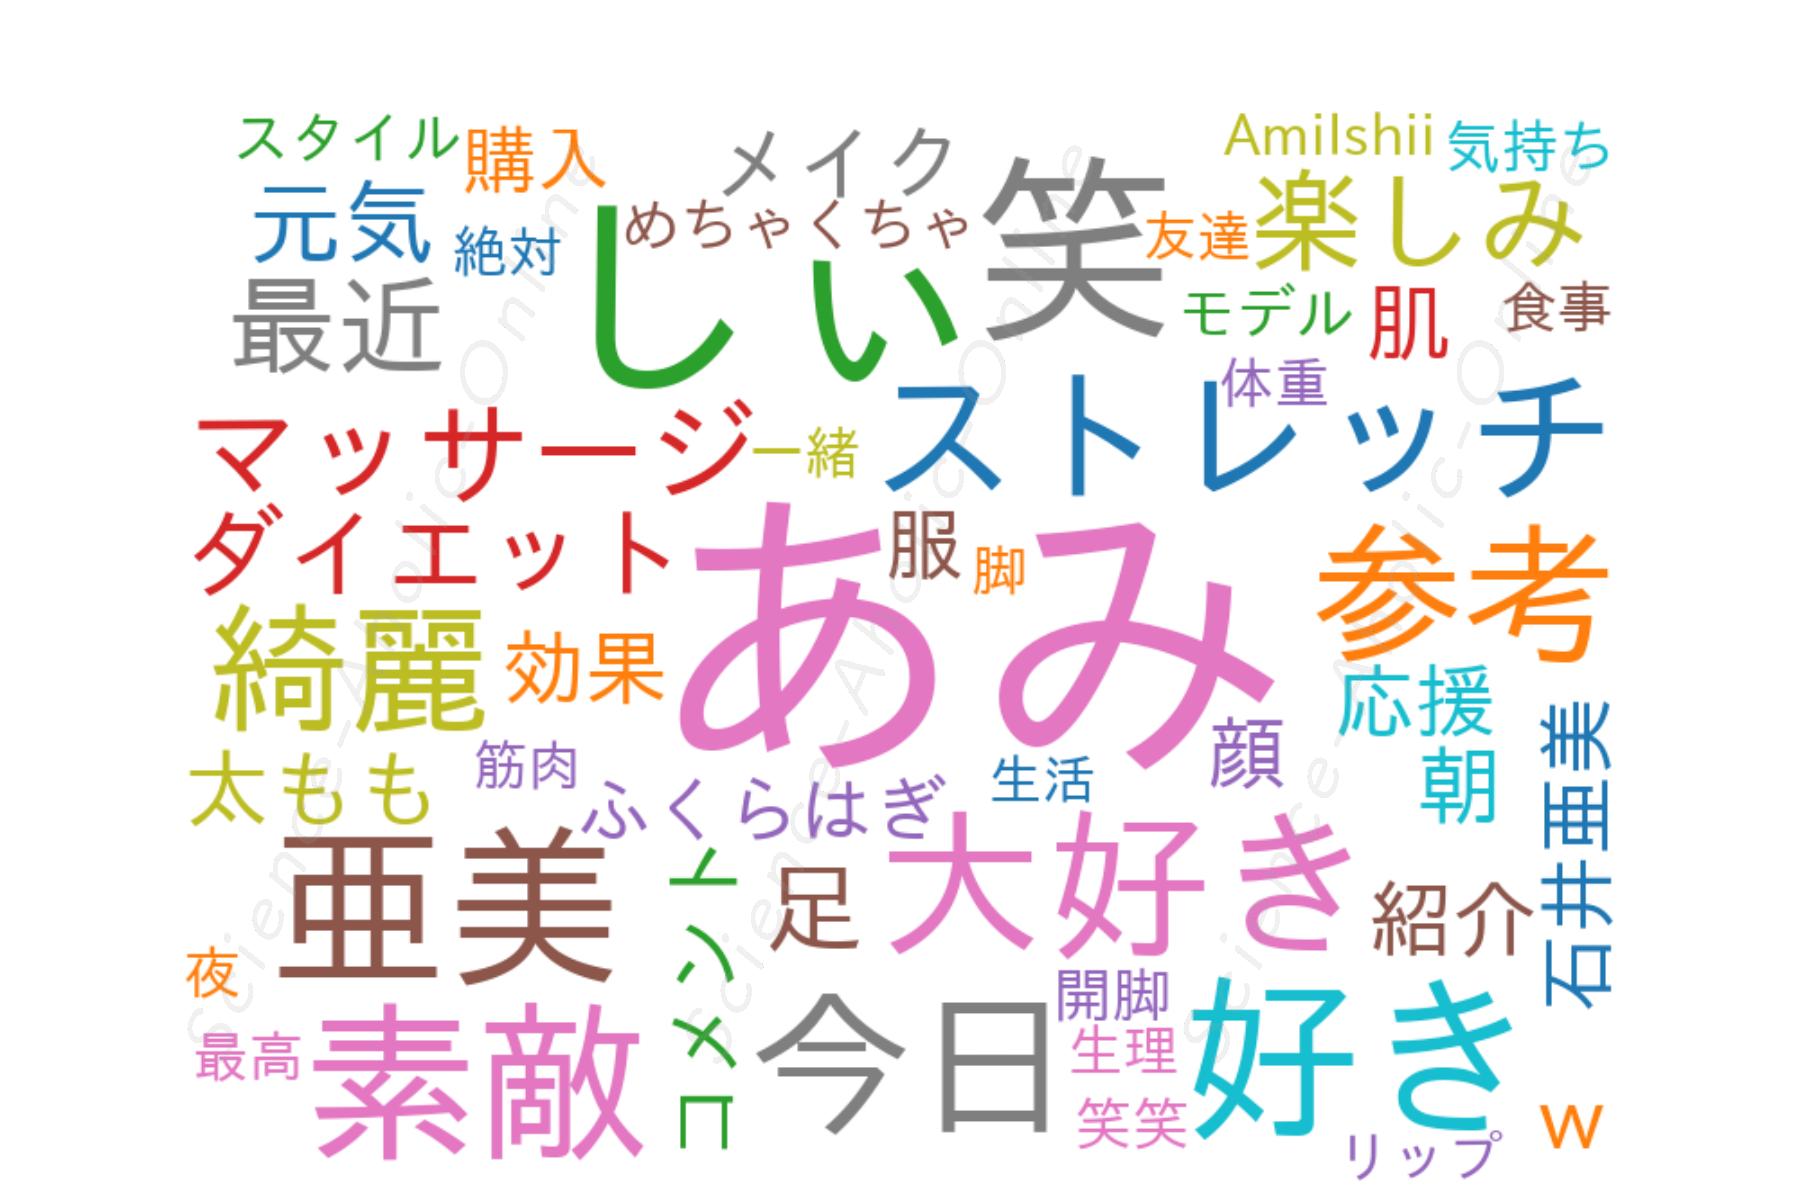 https://science-aholic-online.com/wp-content/uploads/2020/08/wordcloud_石井亜美AmiIshii.png